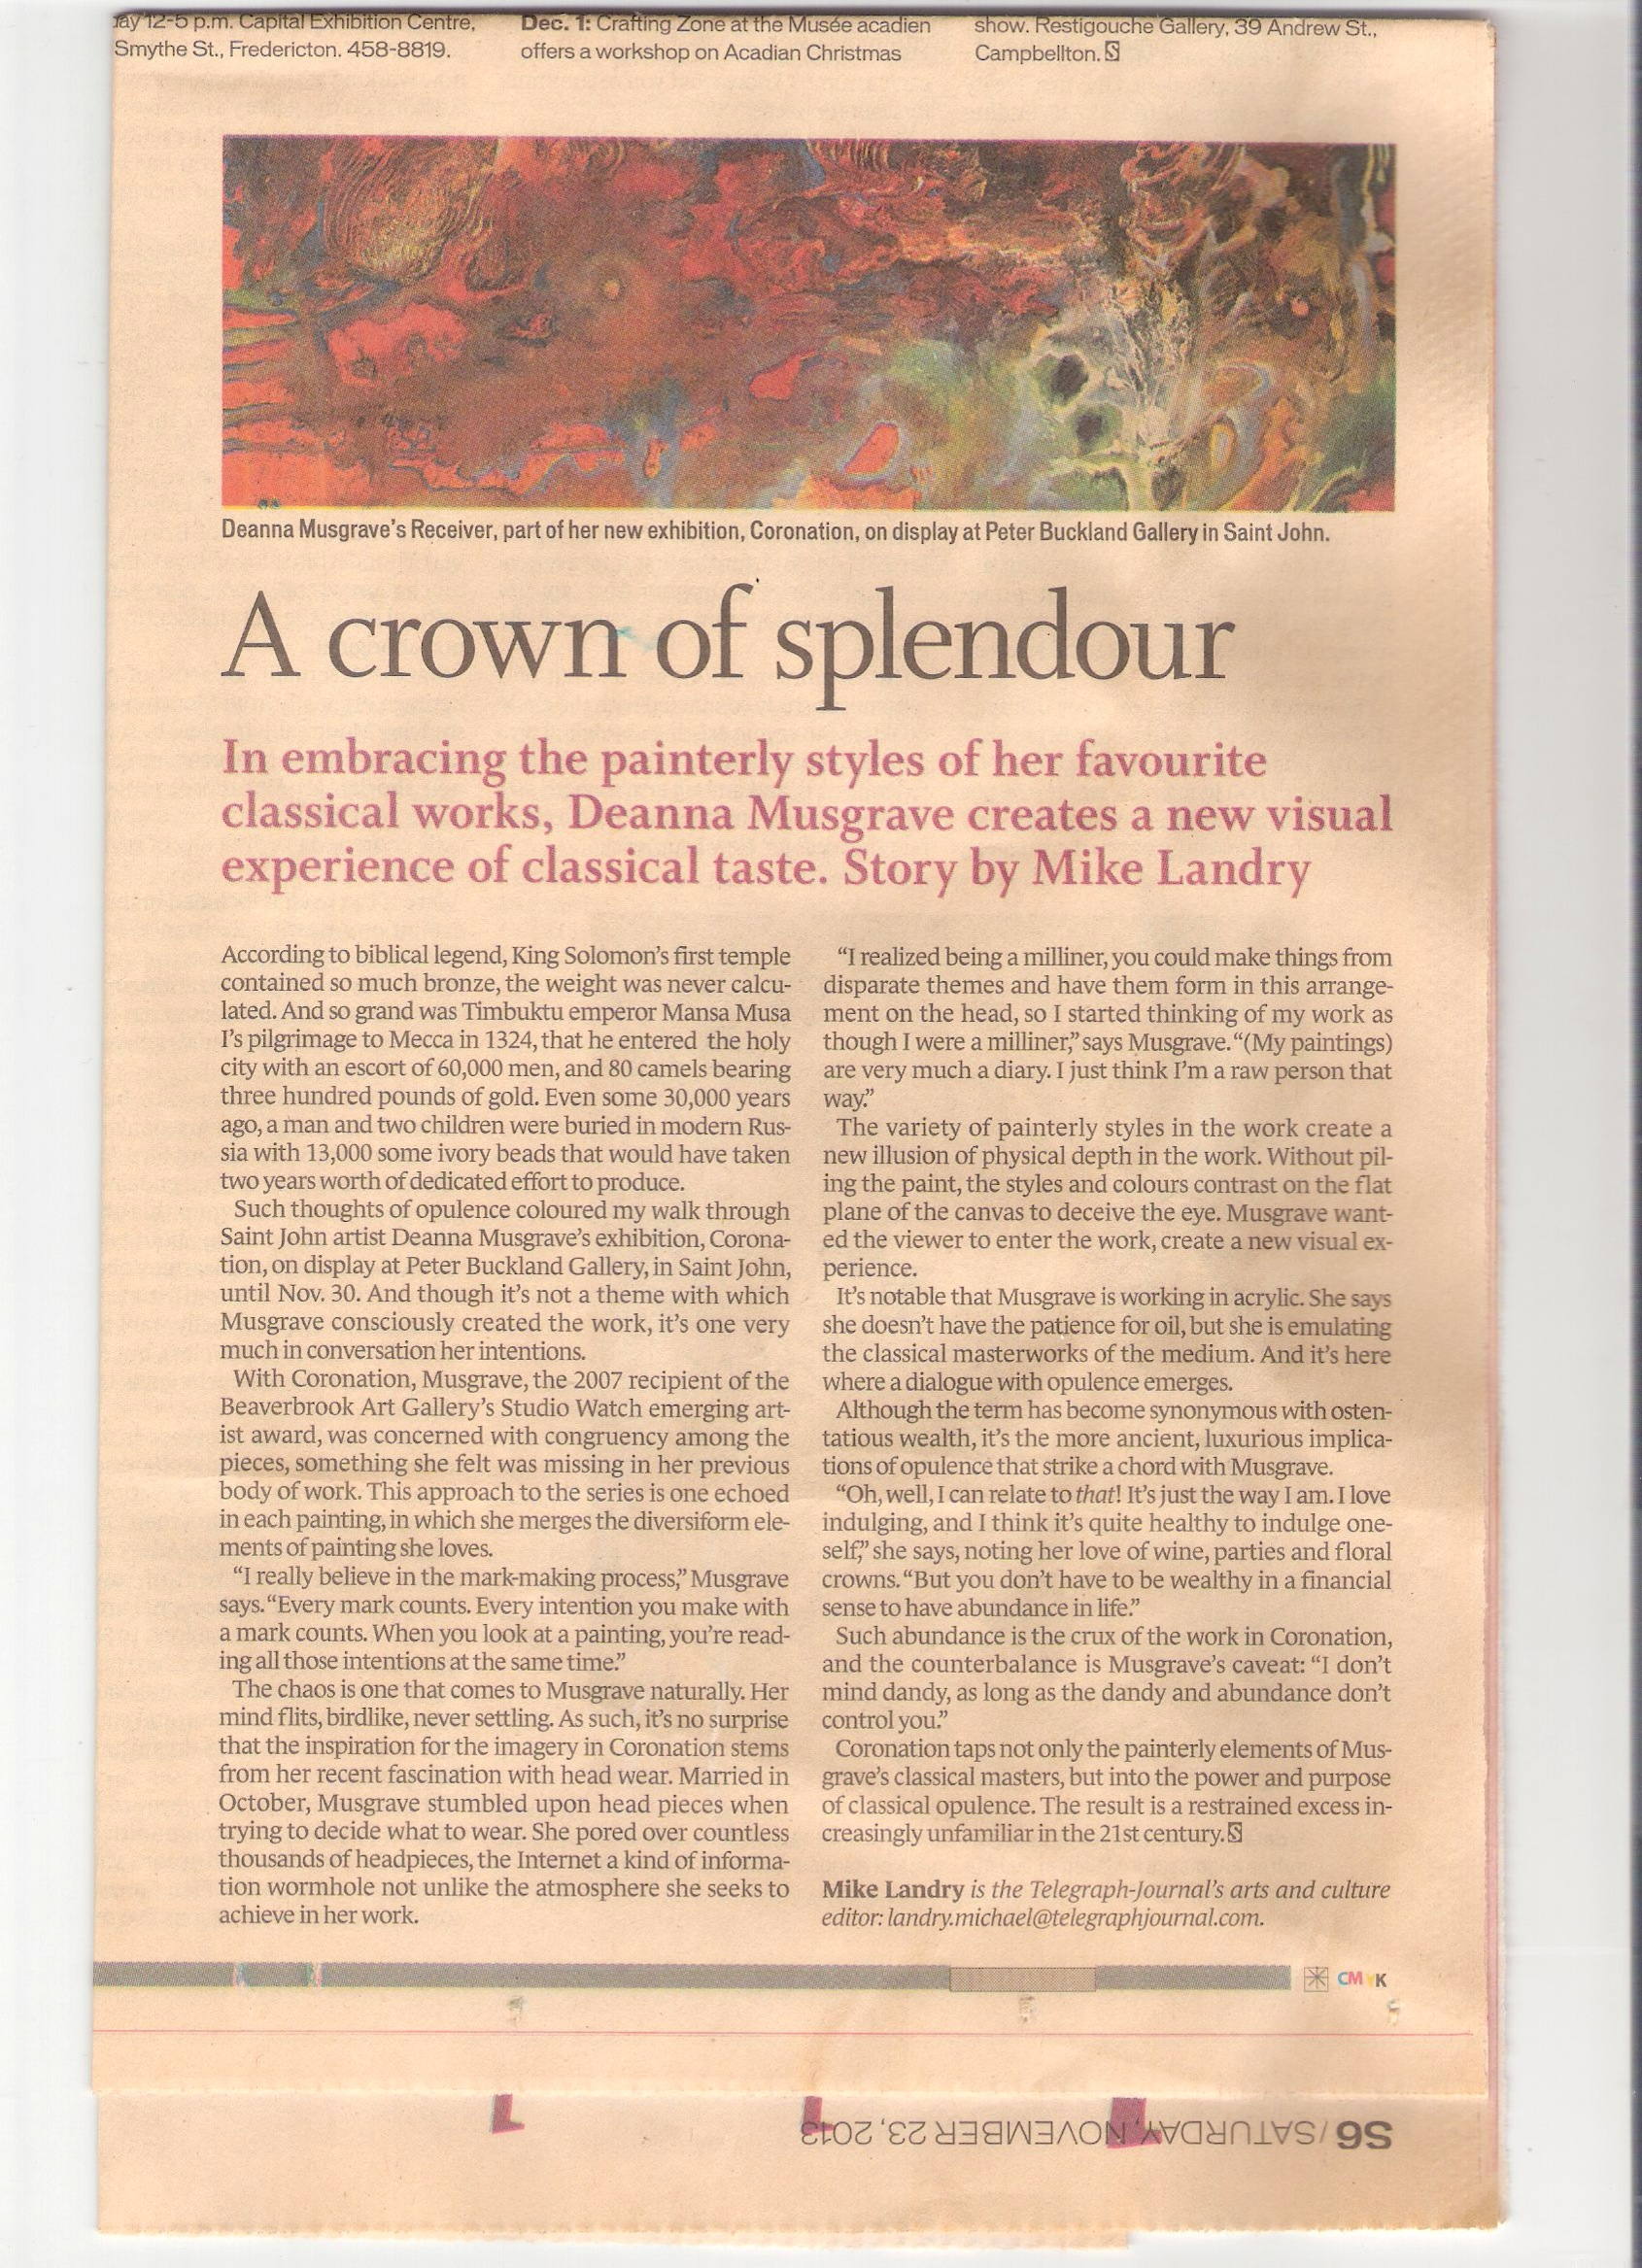 2013 -Mike Landry - Telegraph Journal